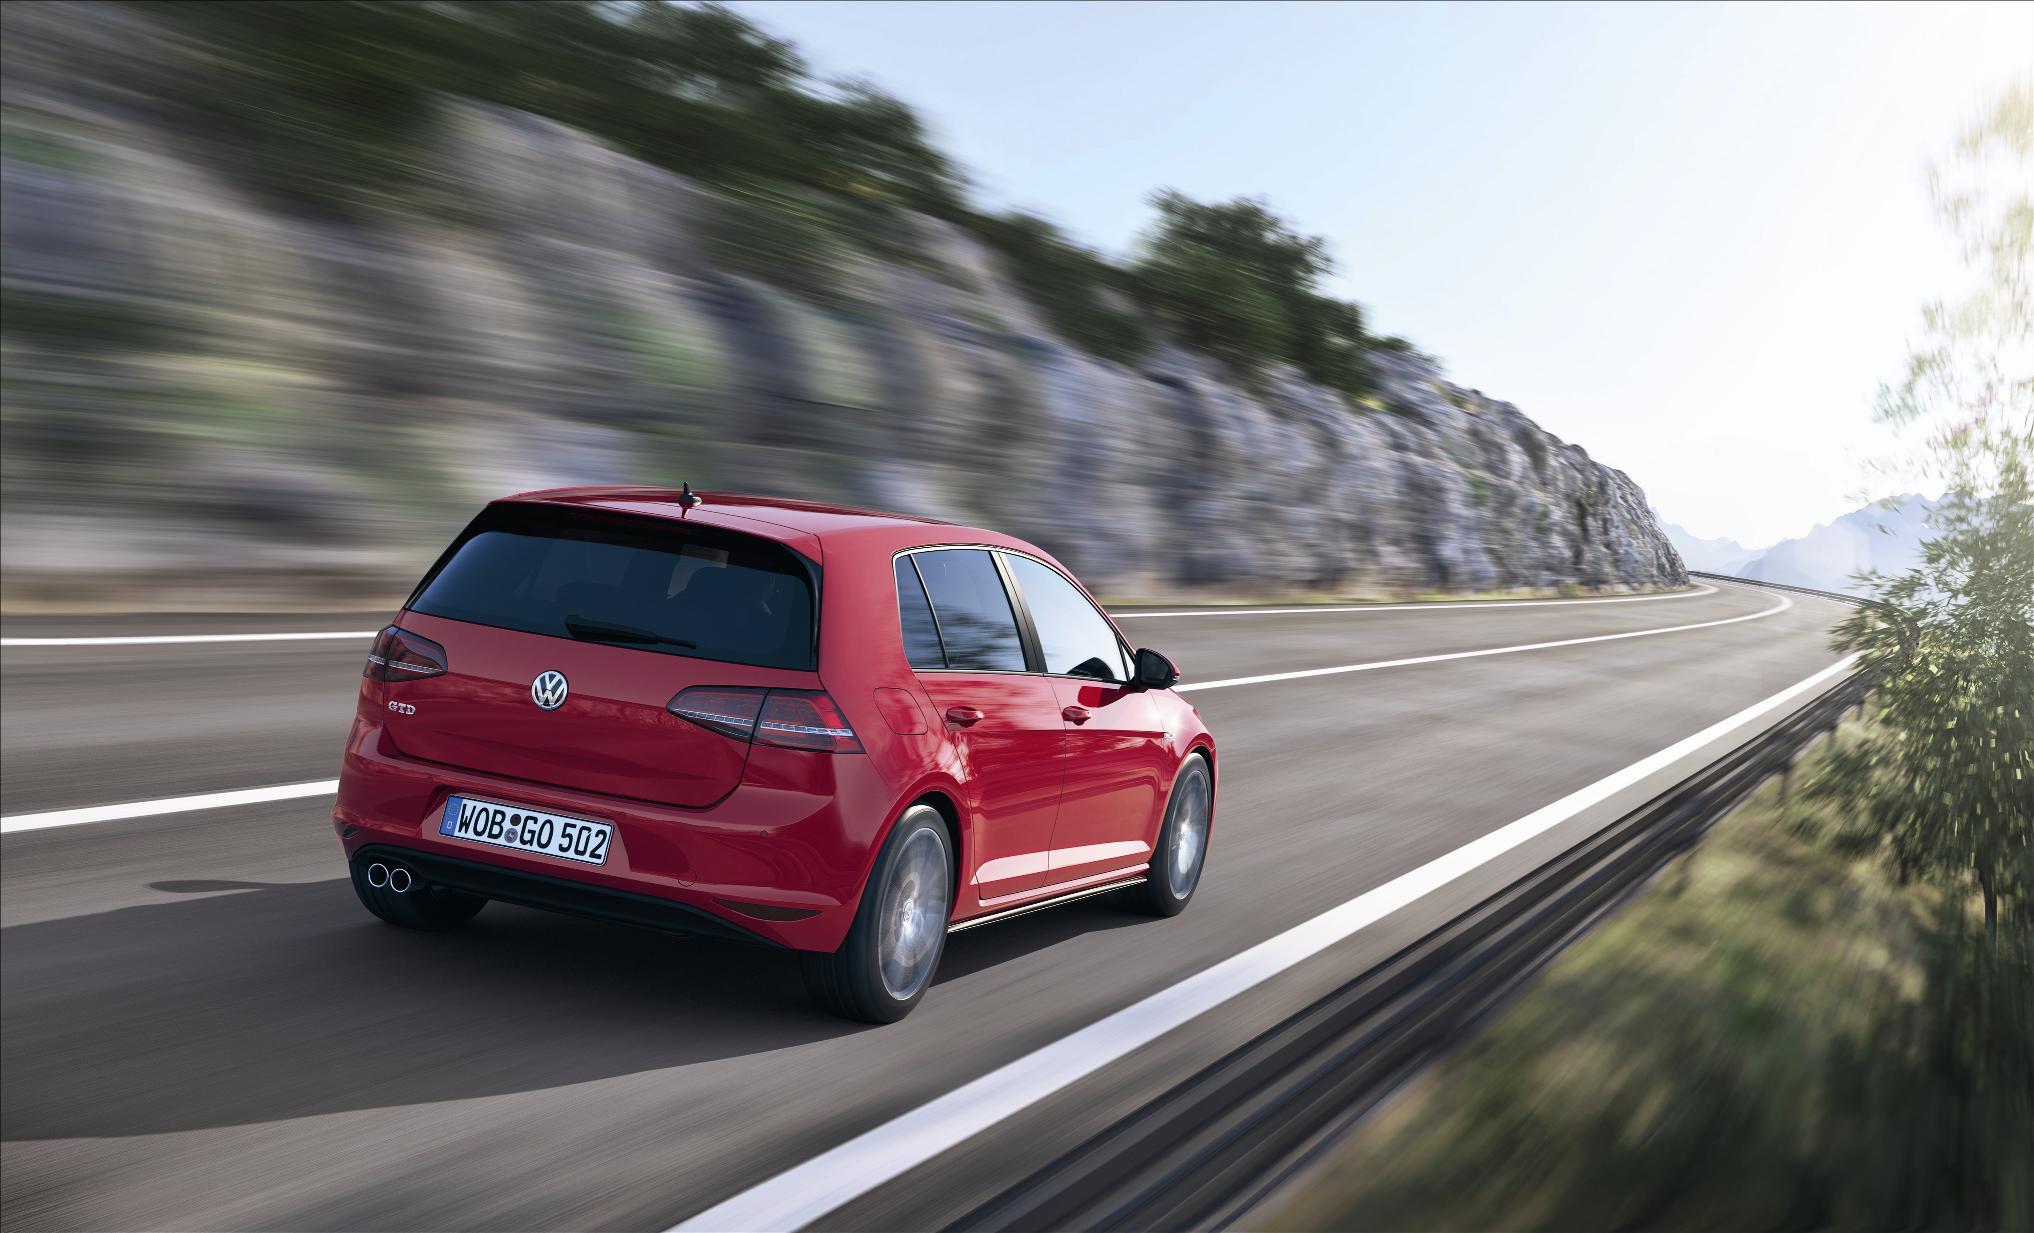 VW Golf GTD 2013 Exhaust